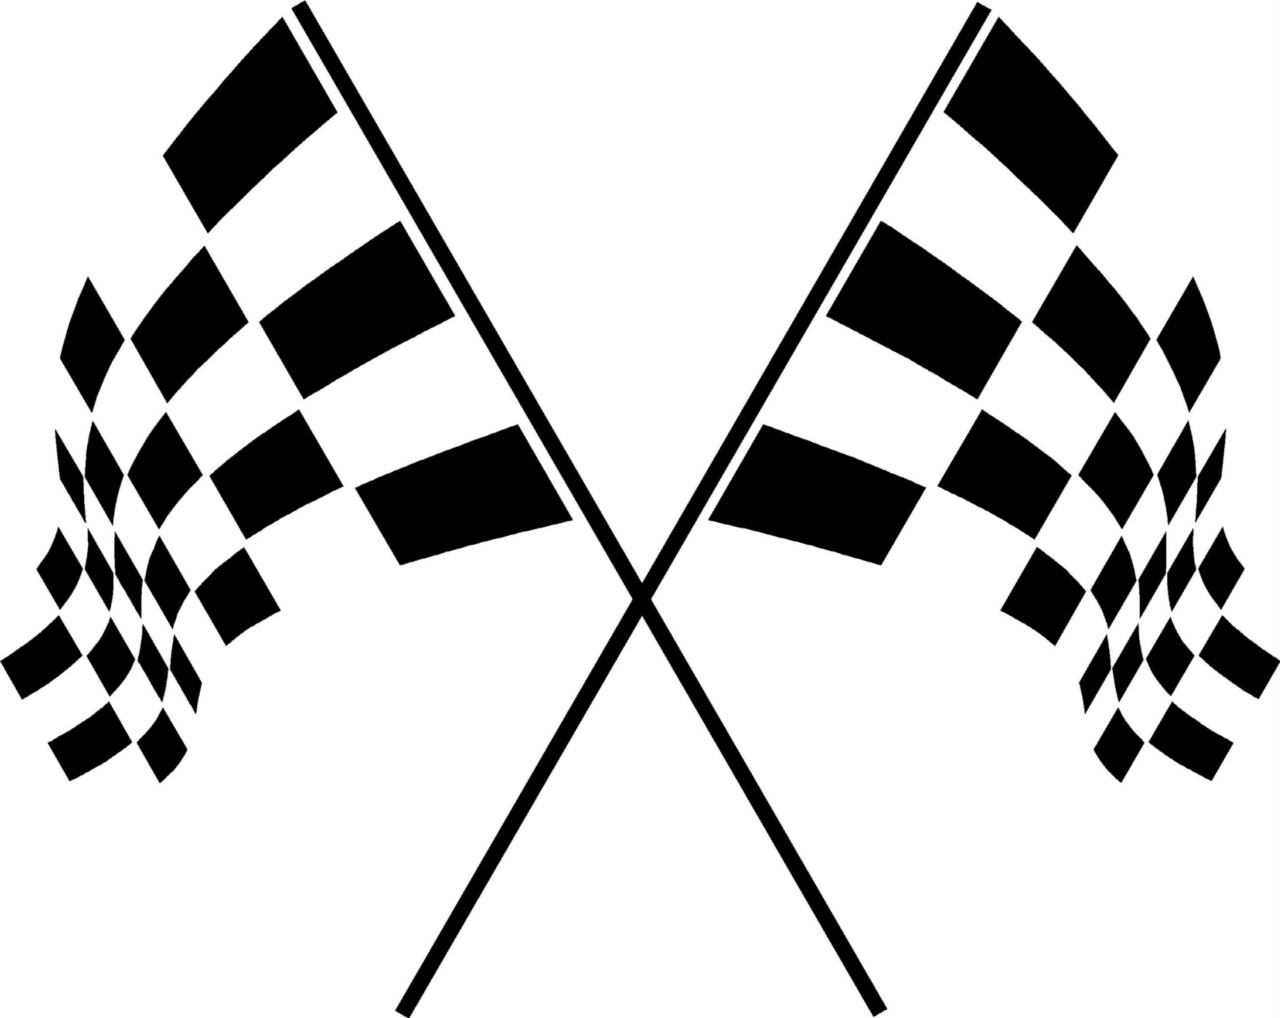 Racing Checkered Flag Clip Art ..-Racing Checkered Flag Clip Art ..-10